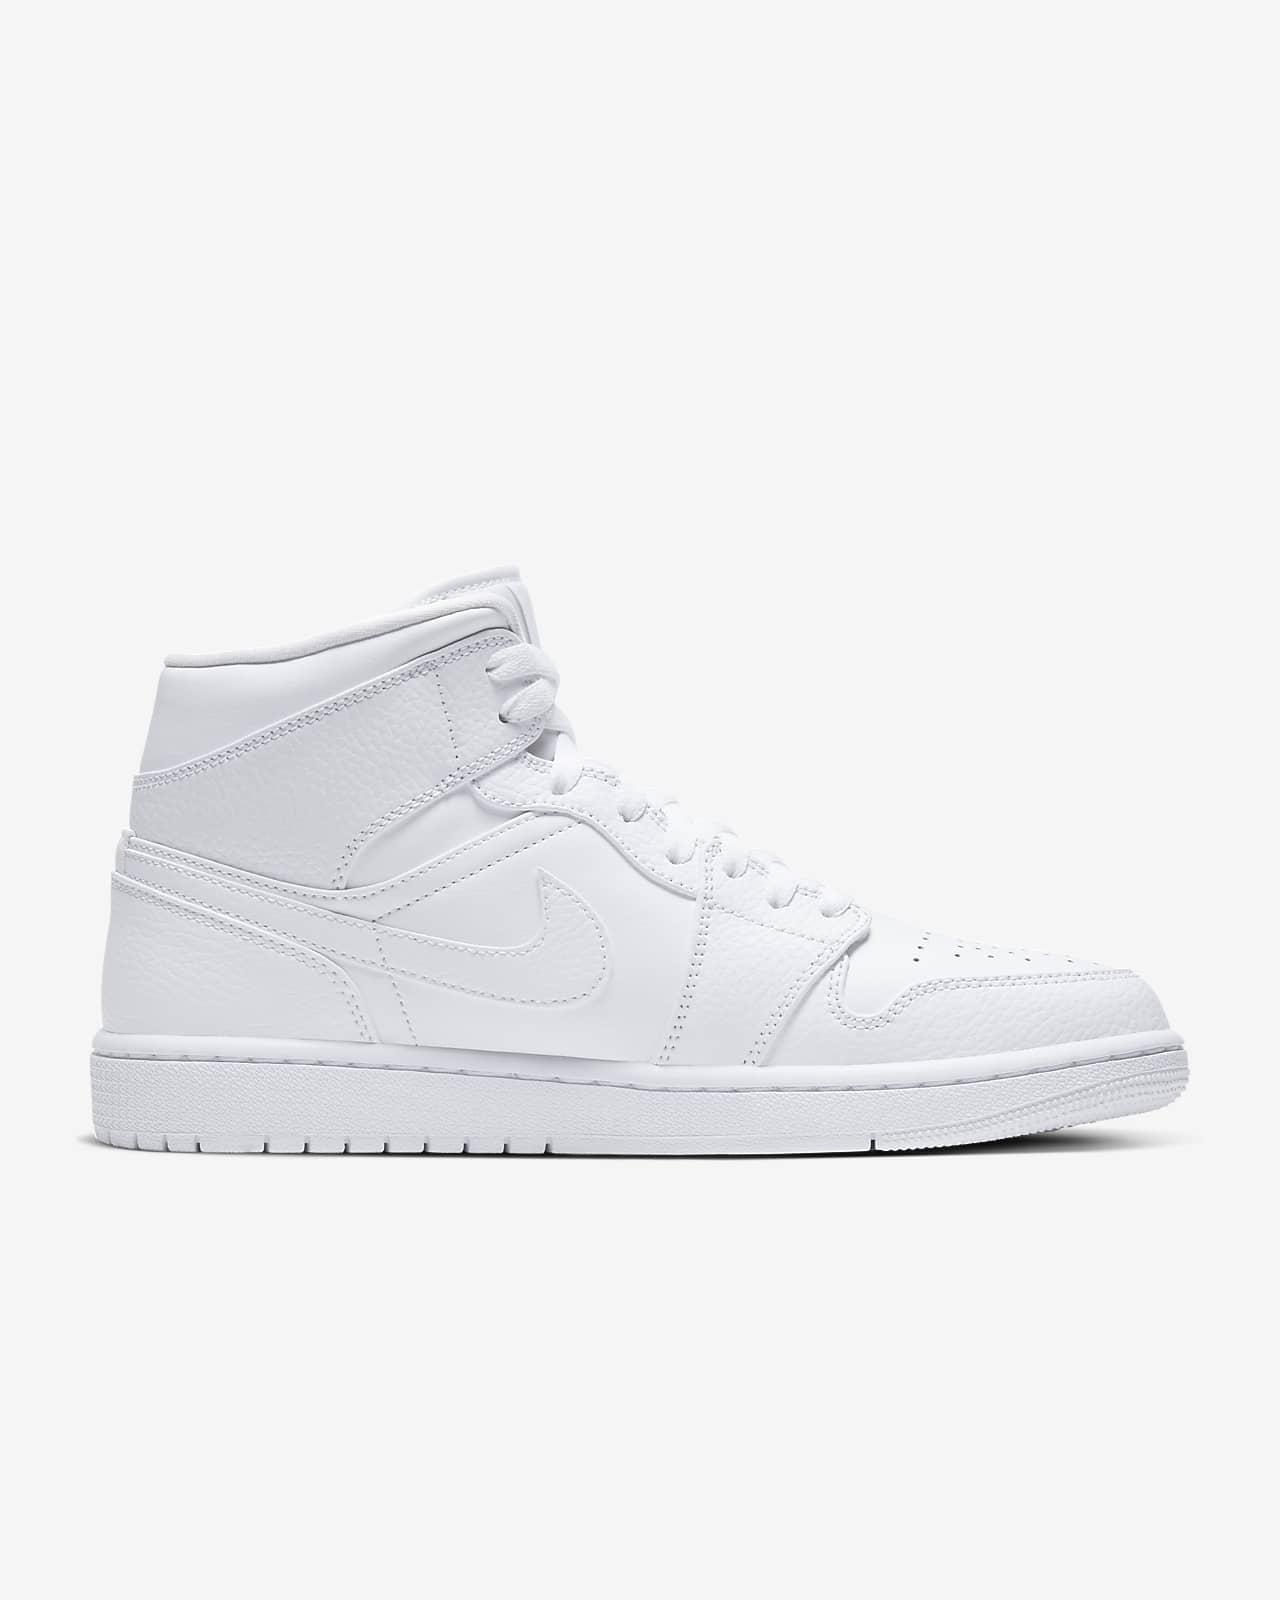 jordan 1 high top white